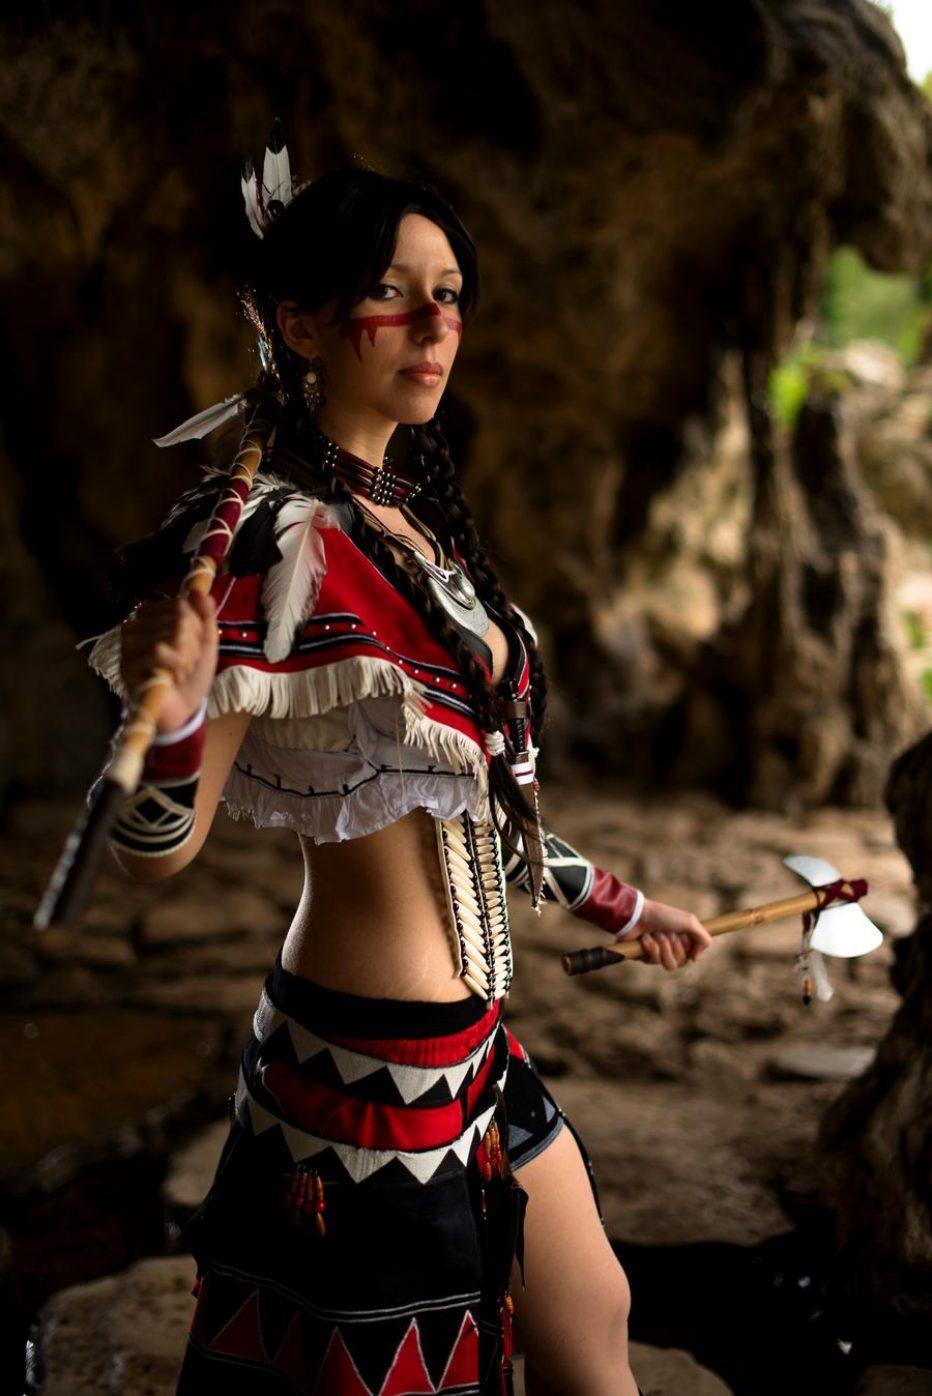 Assassins-Creed-IIIs-Alsoomse-Cosplay-Gamers-Heroes-2.jpg